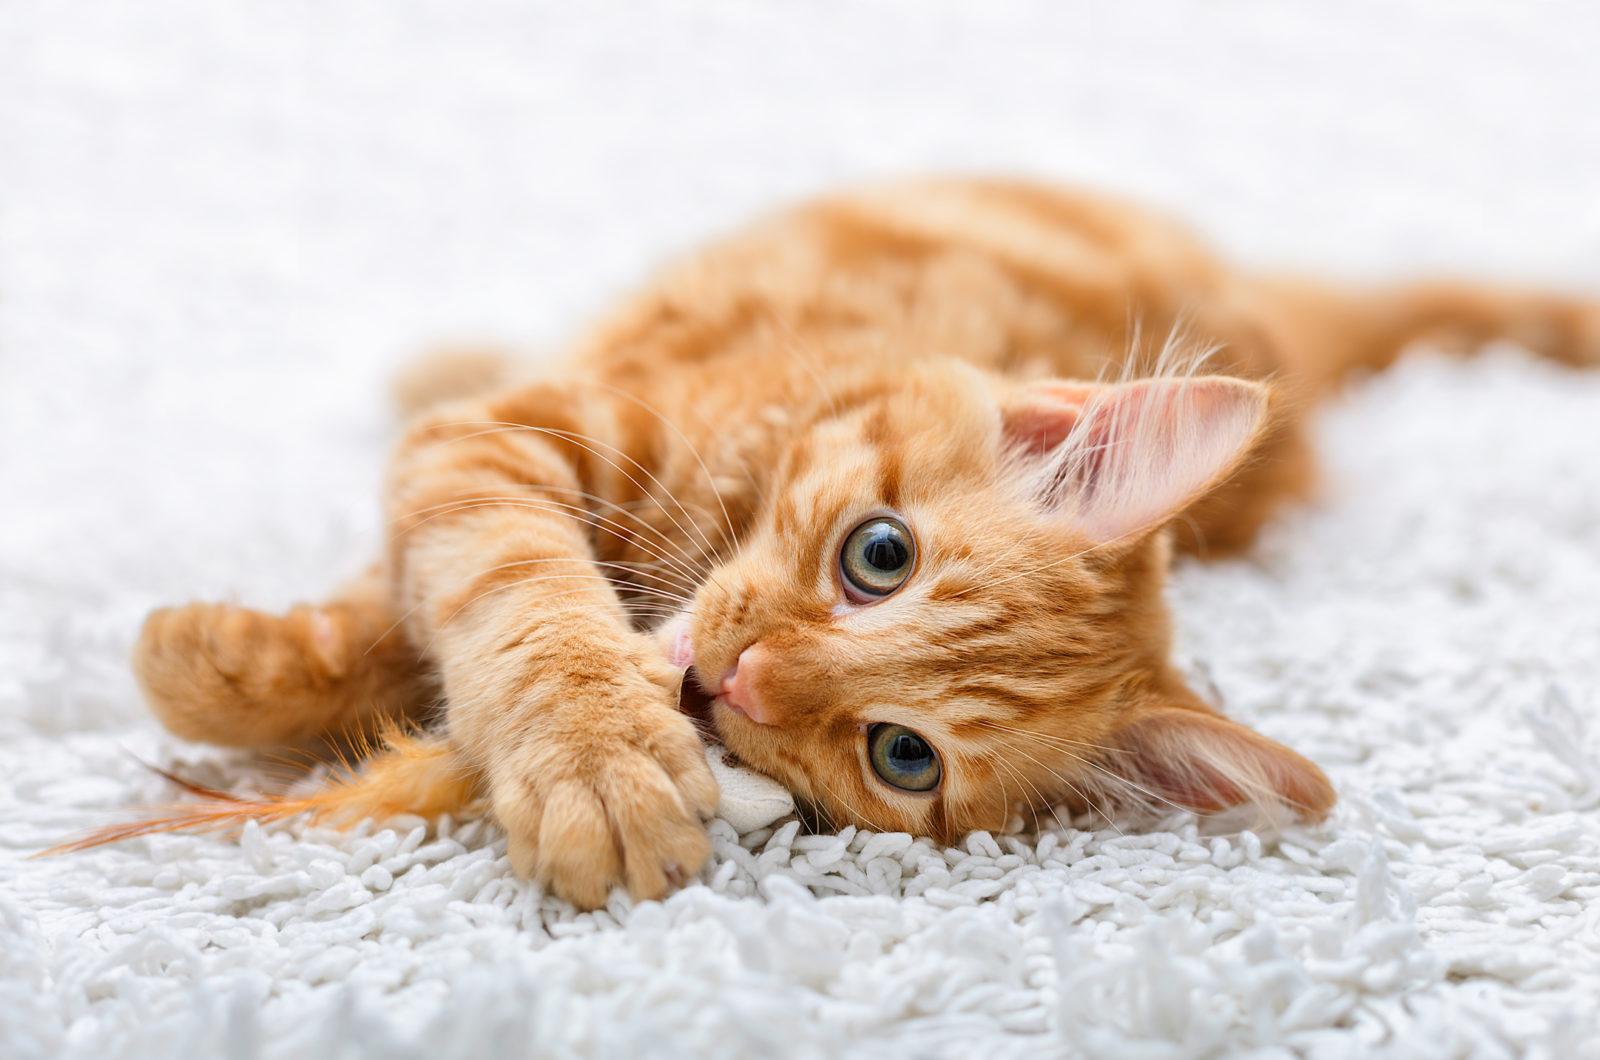 Tierheim-Katze